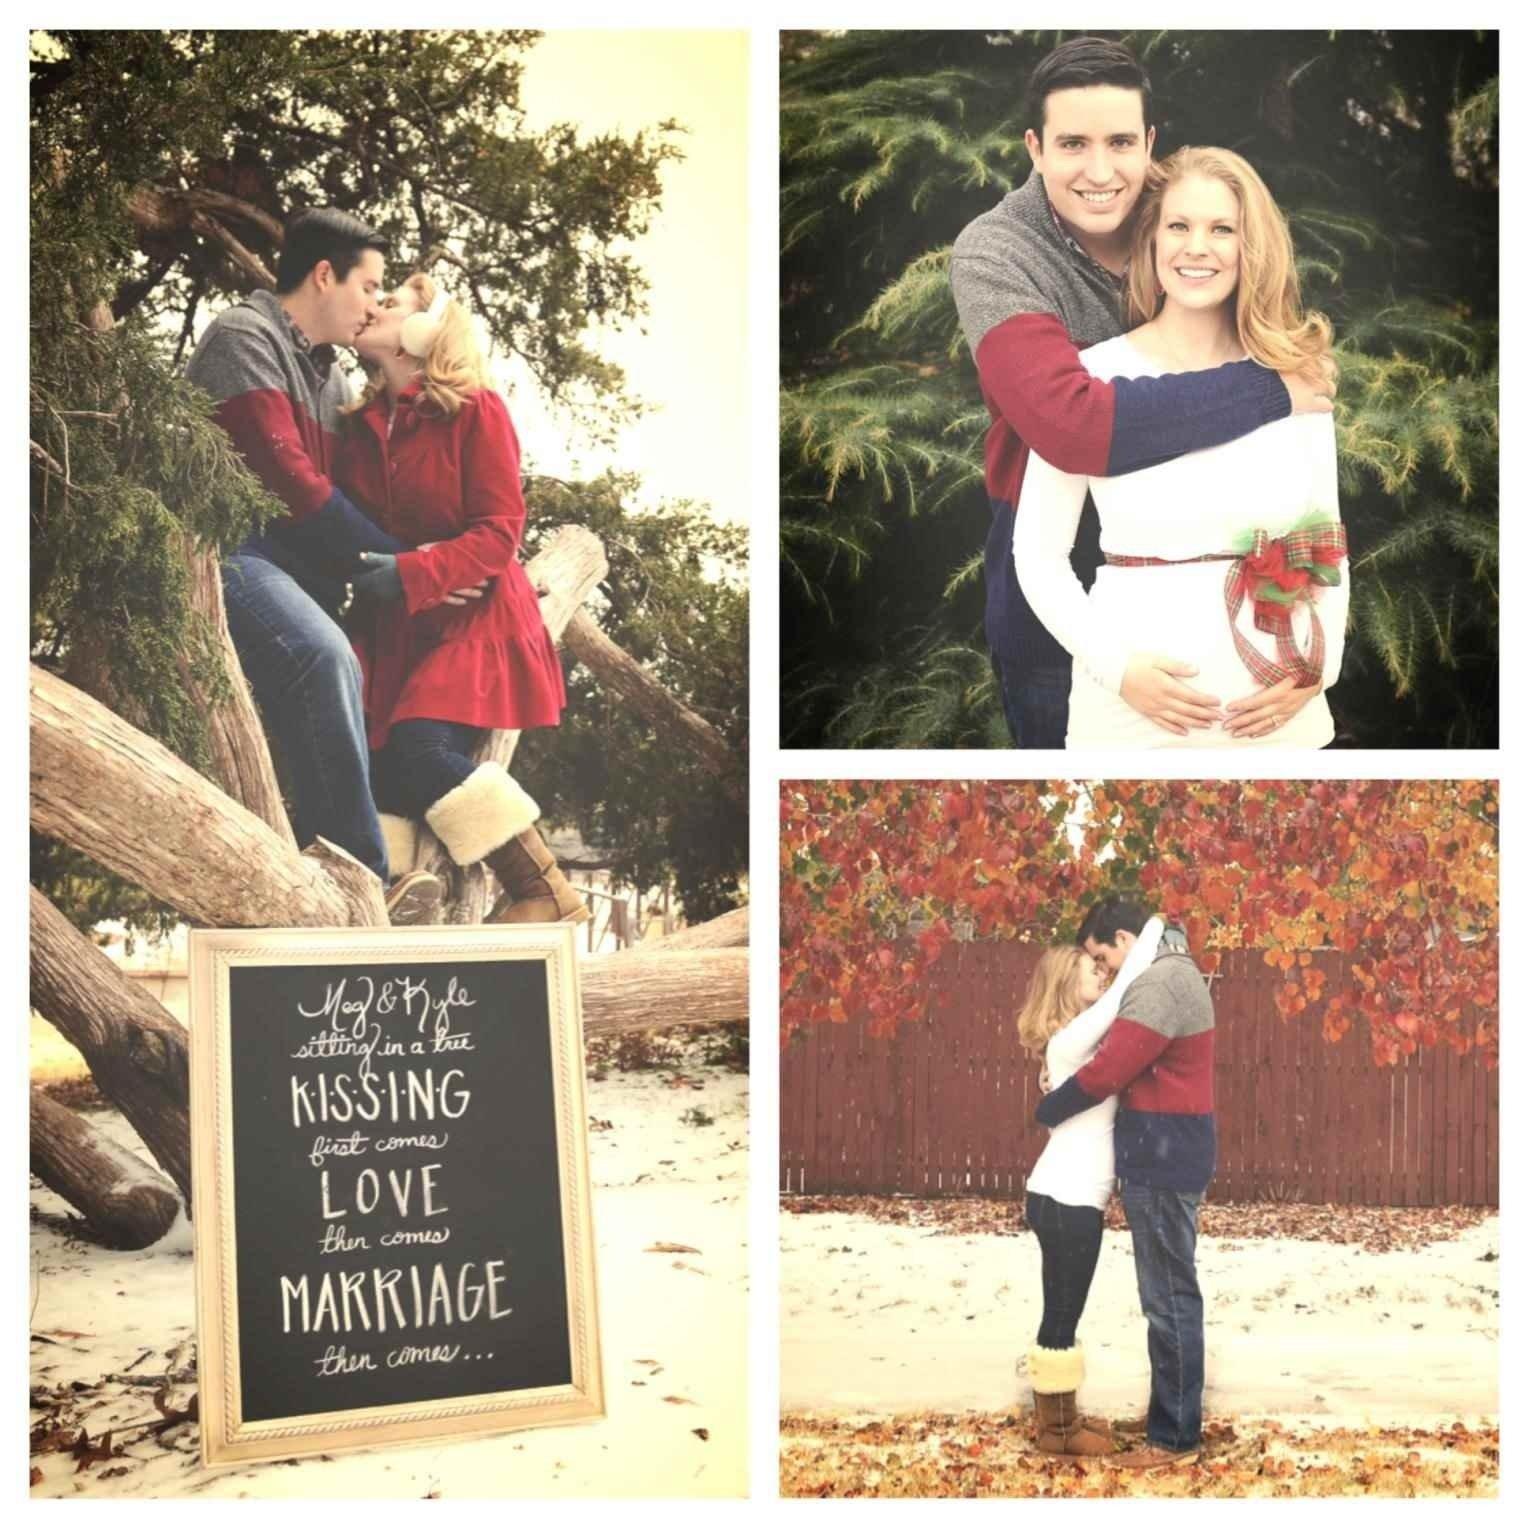 10 Elegant Funny Couple Christmas Card Ideas funny christmas card photo ideas for couples merry christmas 1